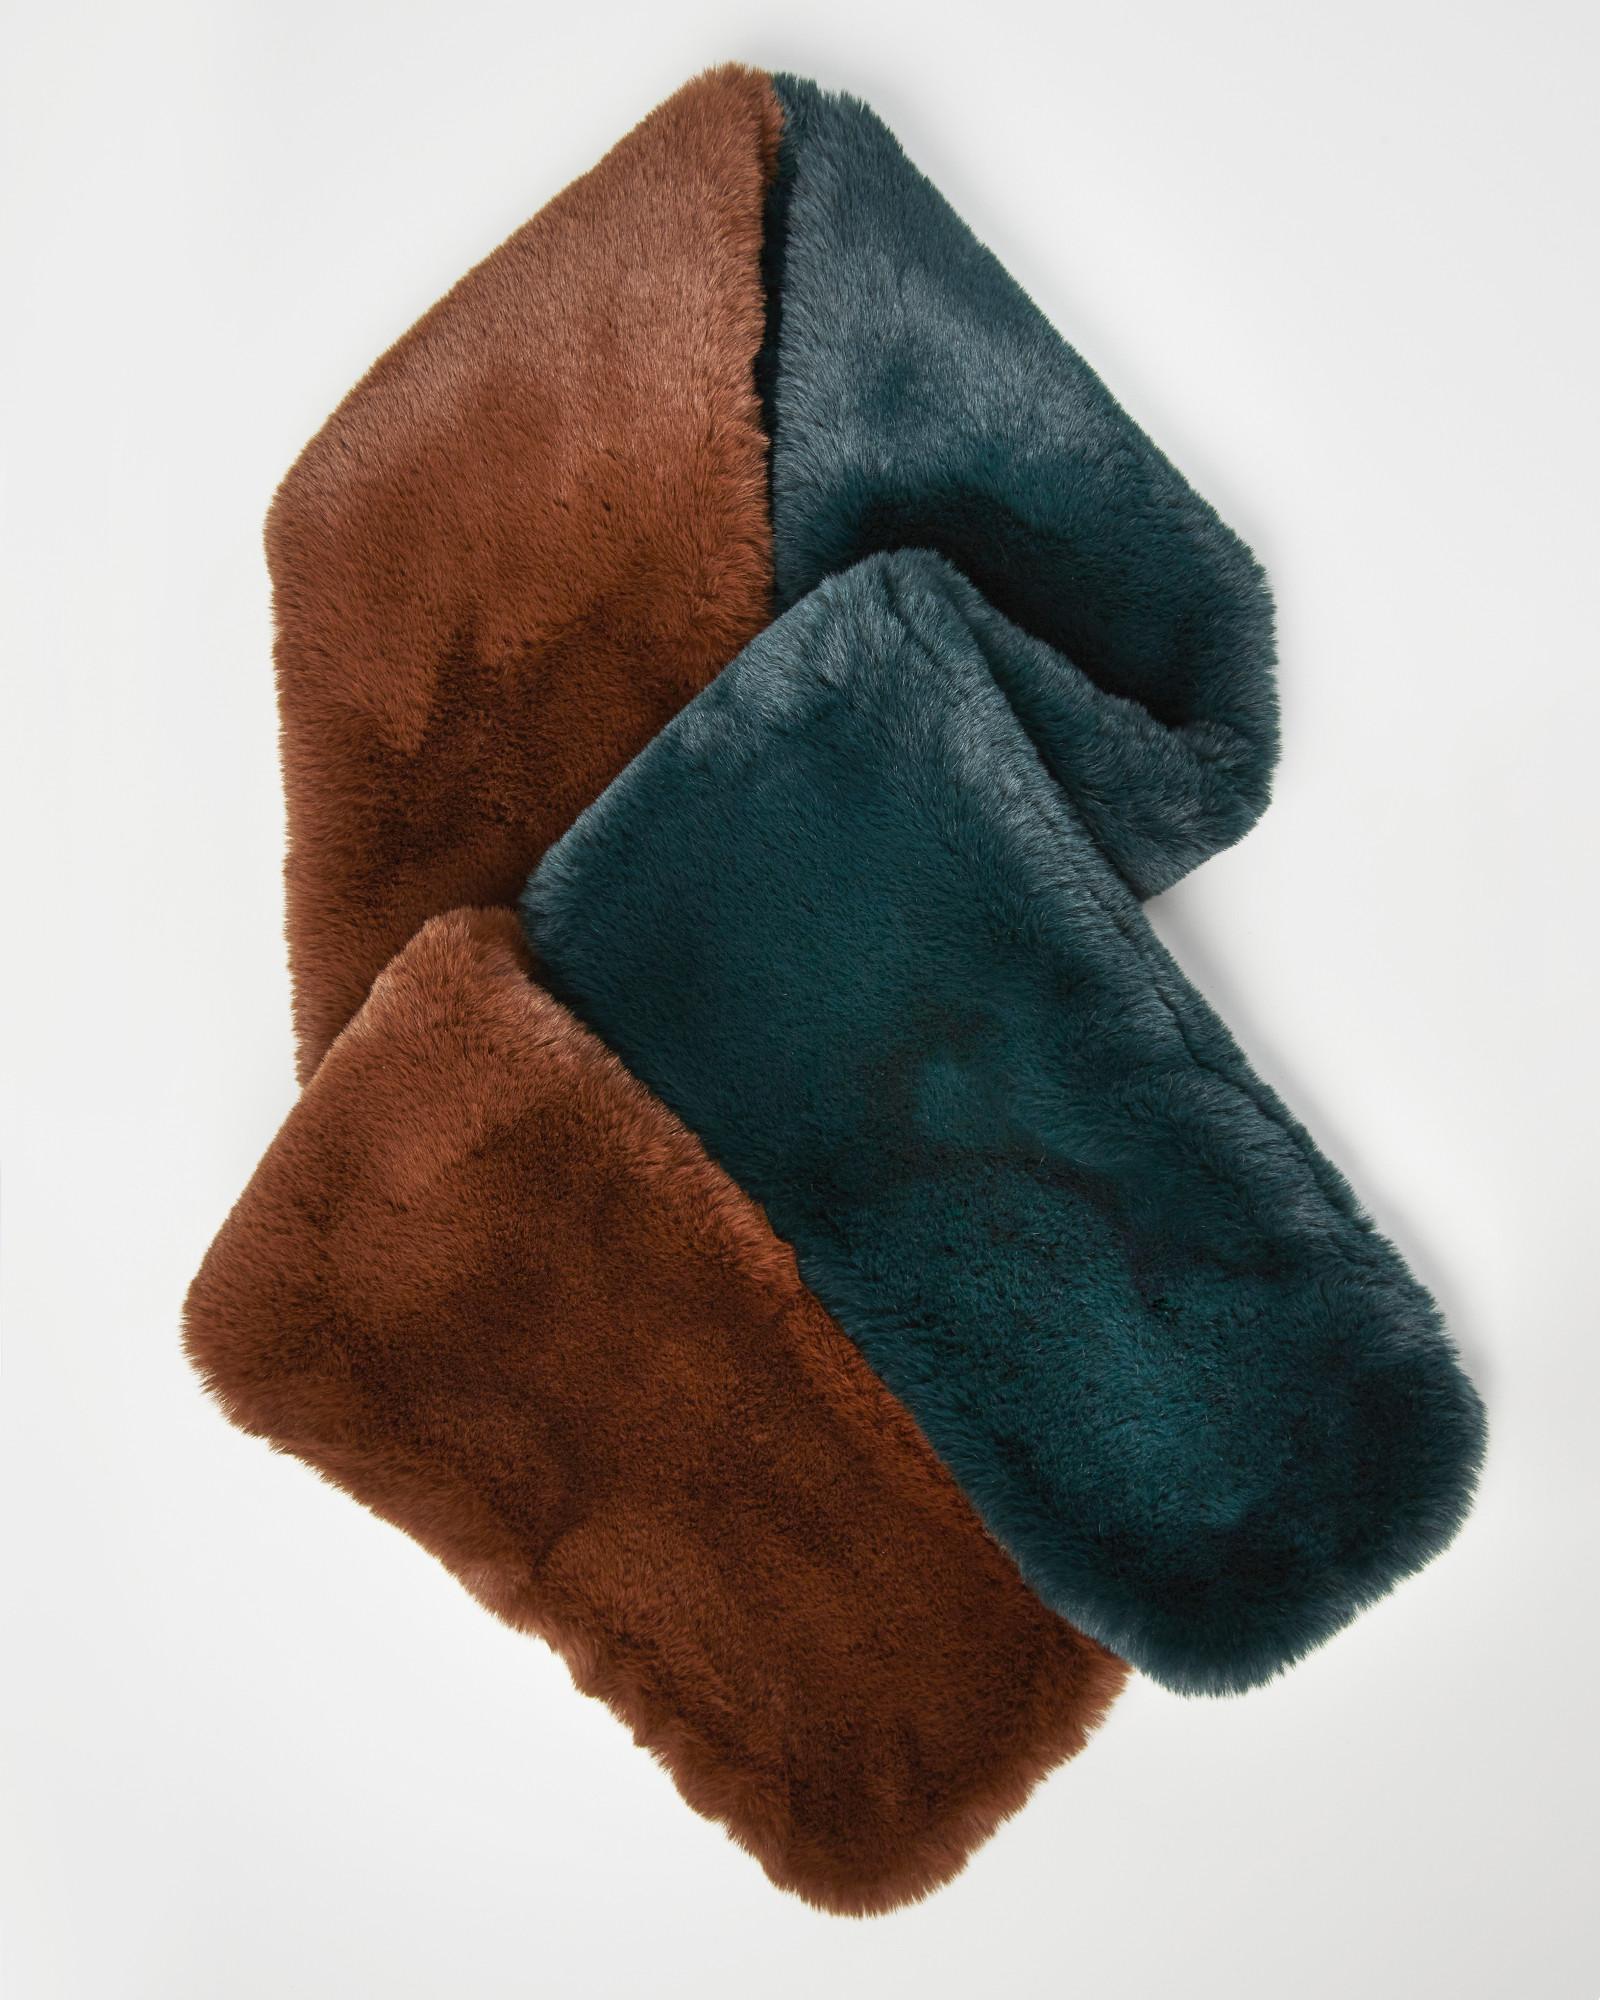 Oliver Bonas Women Faux Fur Brown Ankle Slipper Socks